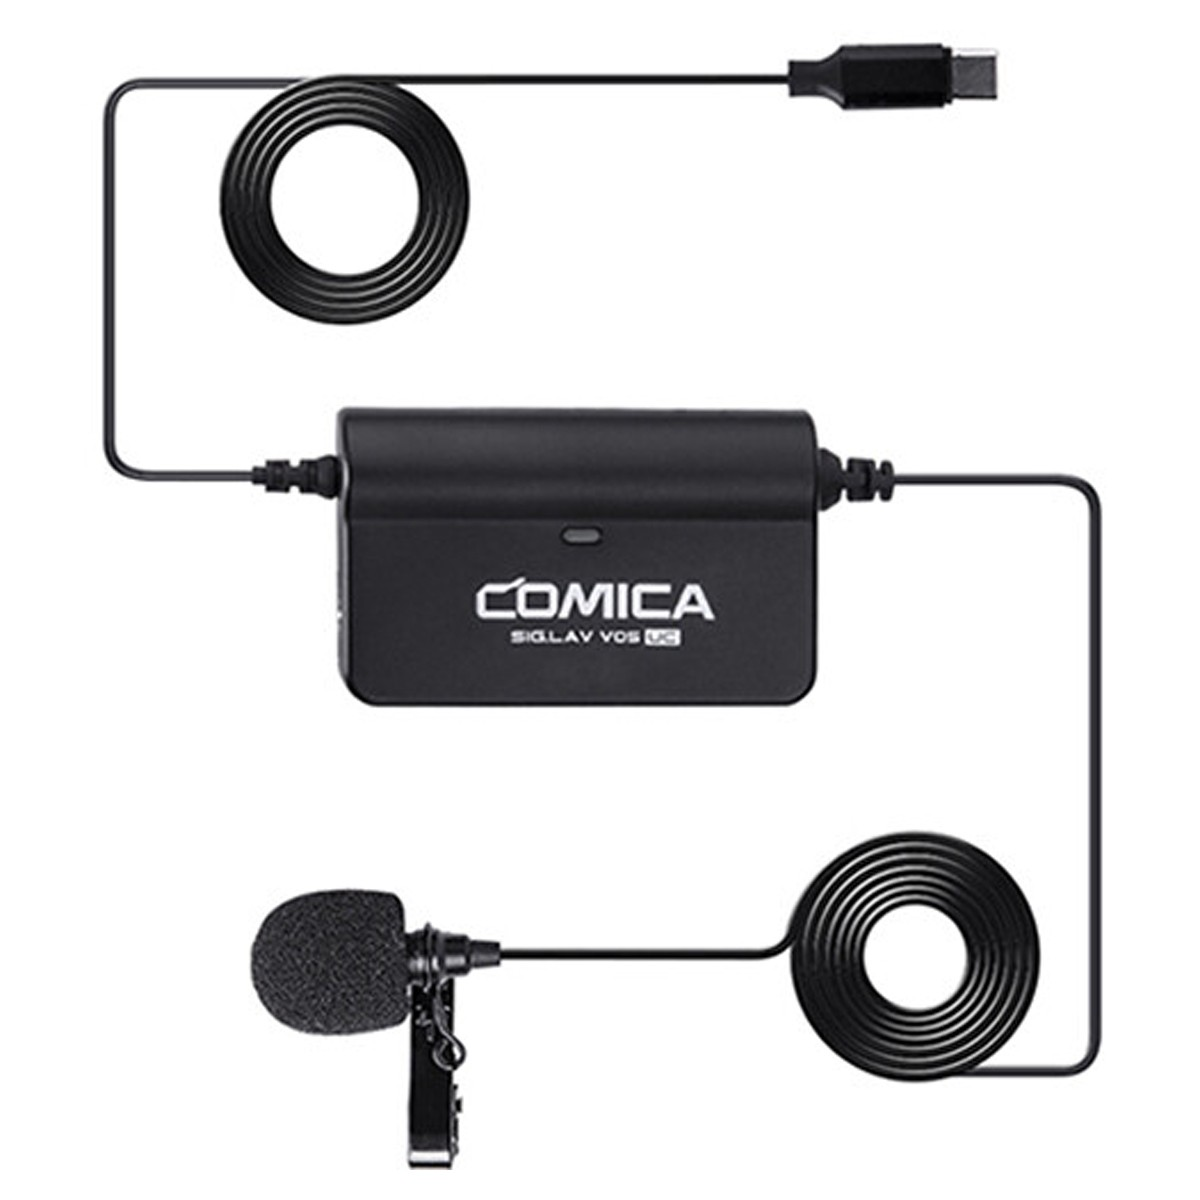 Microfone lapela para Smartphone USB-C Comica SIGLAVV05UC